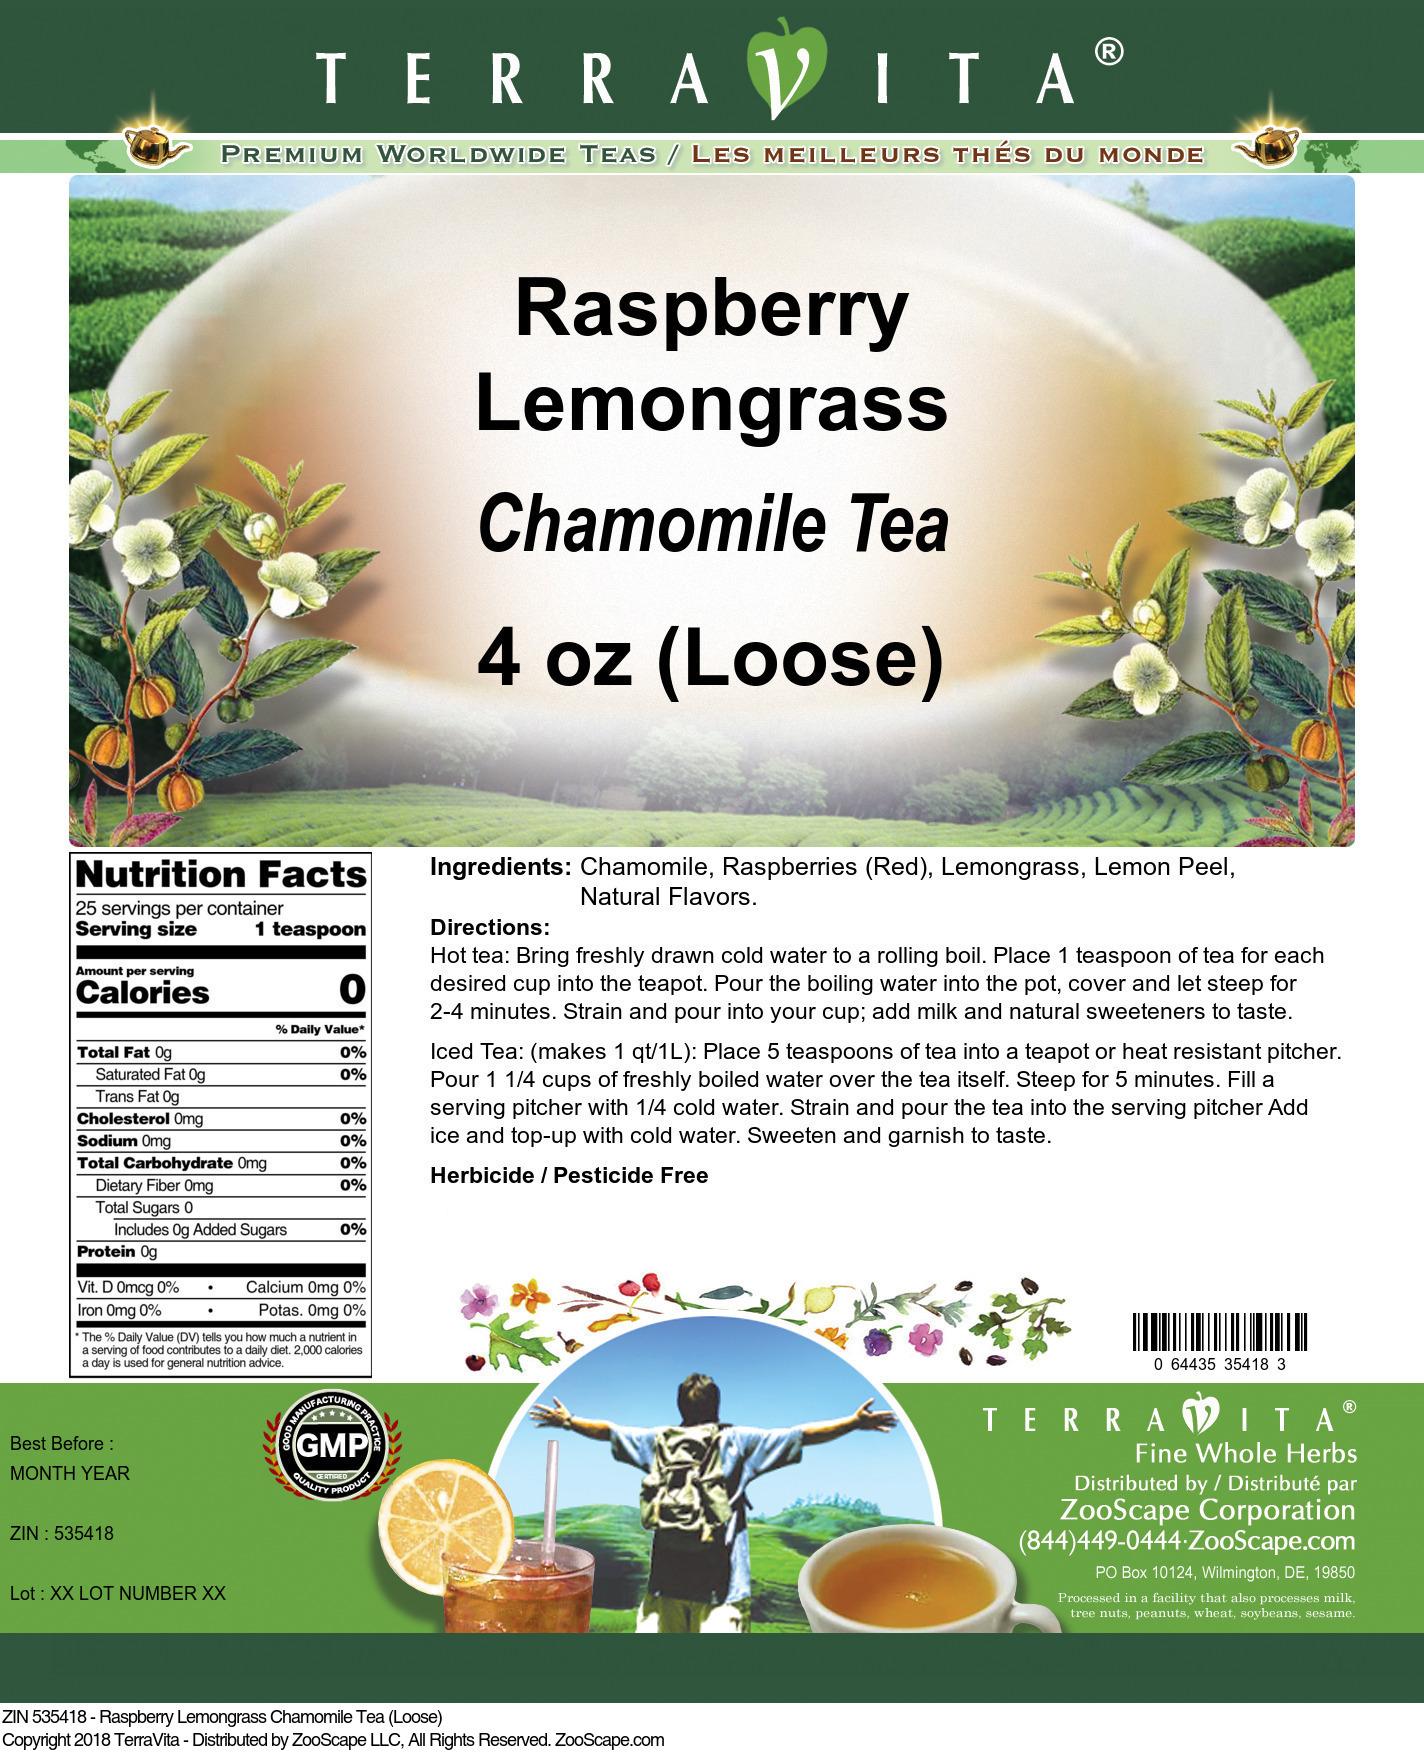 Raspberry Lemongrass Chamomile Tea